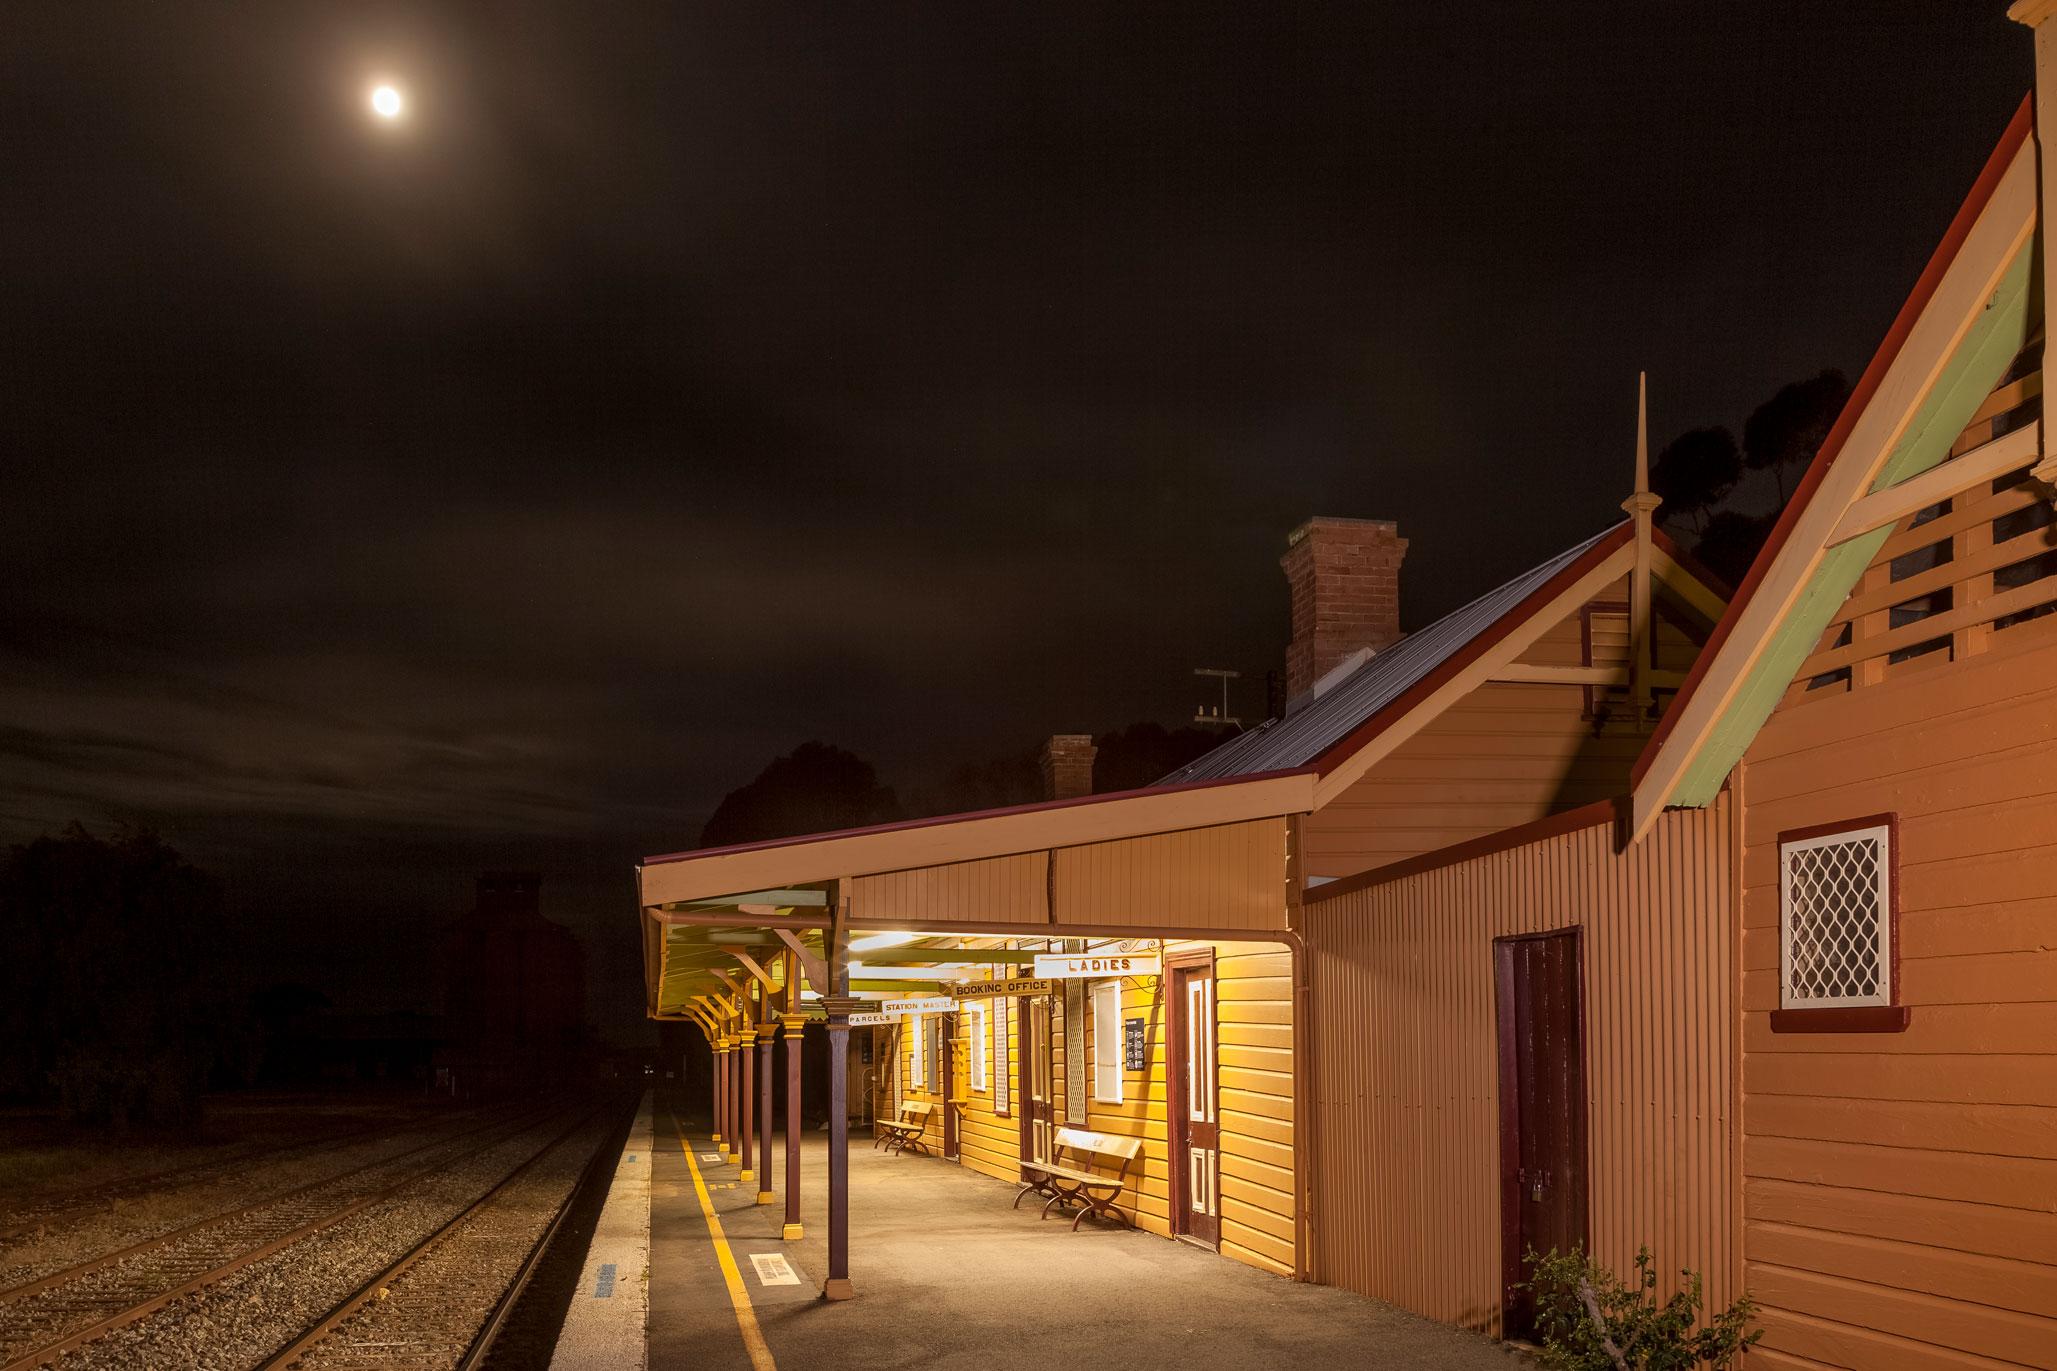 1045---Wendy-Slater,-B,-Moonlight-Train.jpg